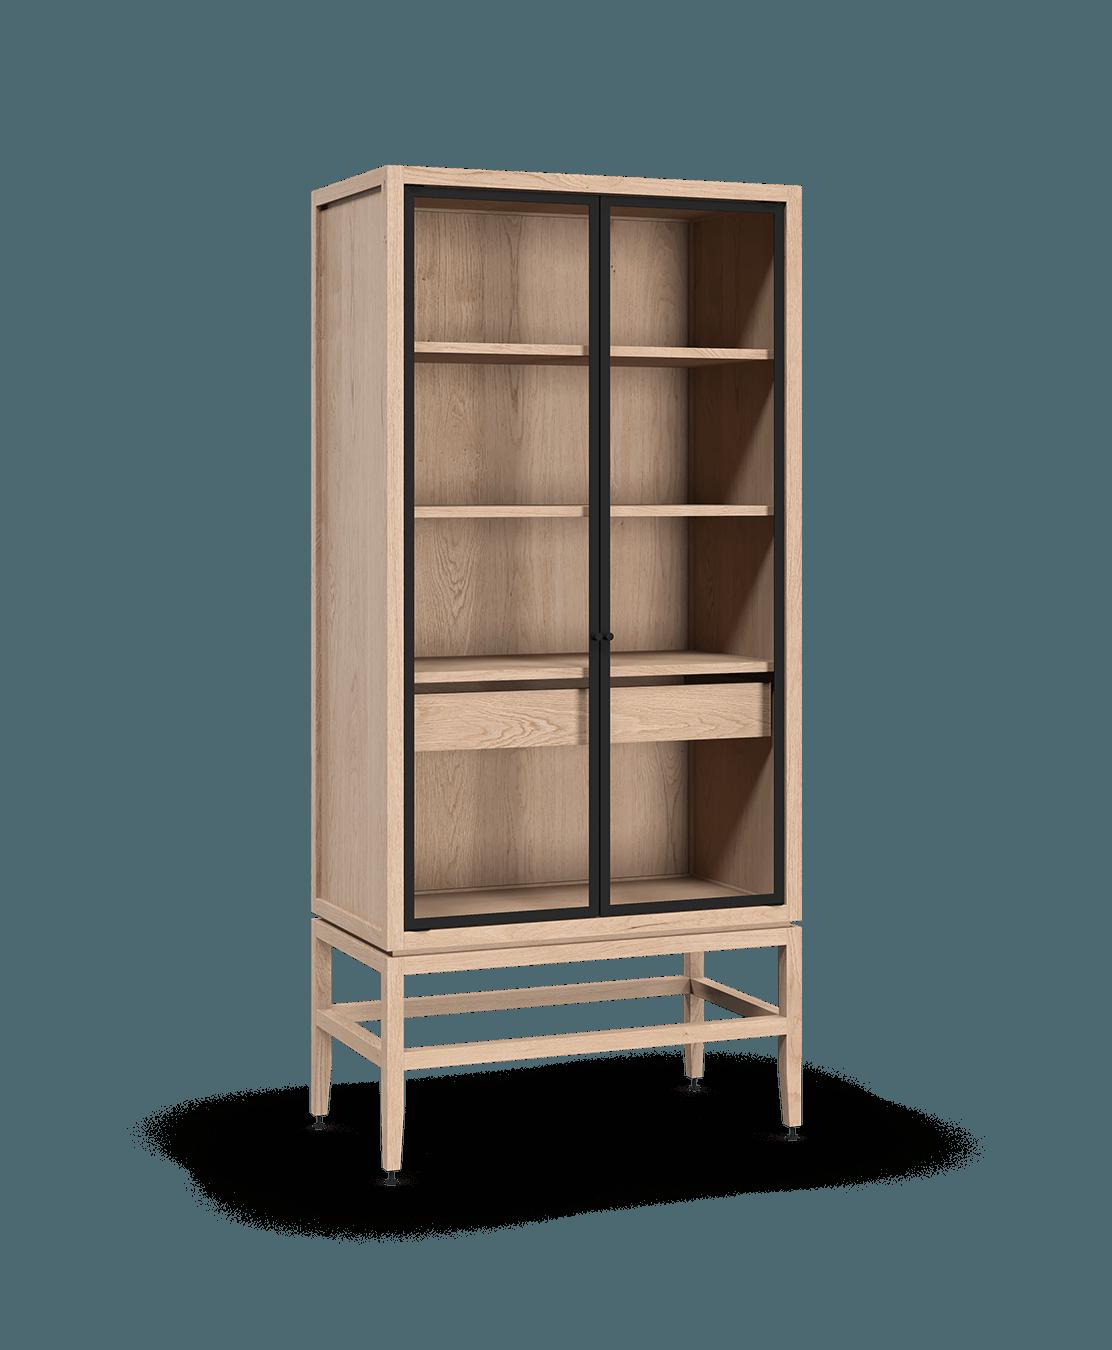 coquo volitare white oak solid wood modular 2 glass doors storage glass display hutch cabinet 33 inch C2-D-3318-1202-NA